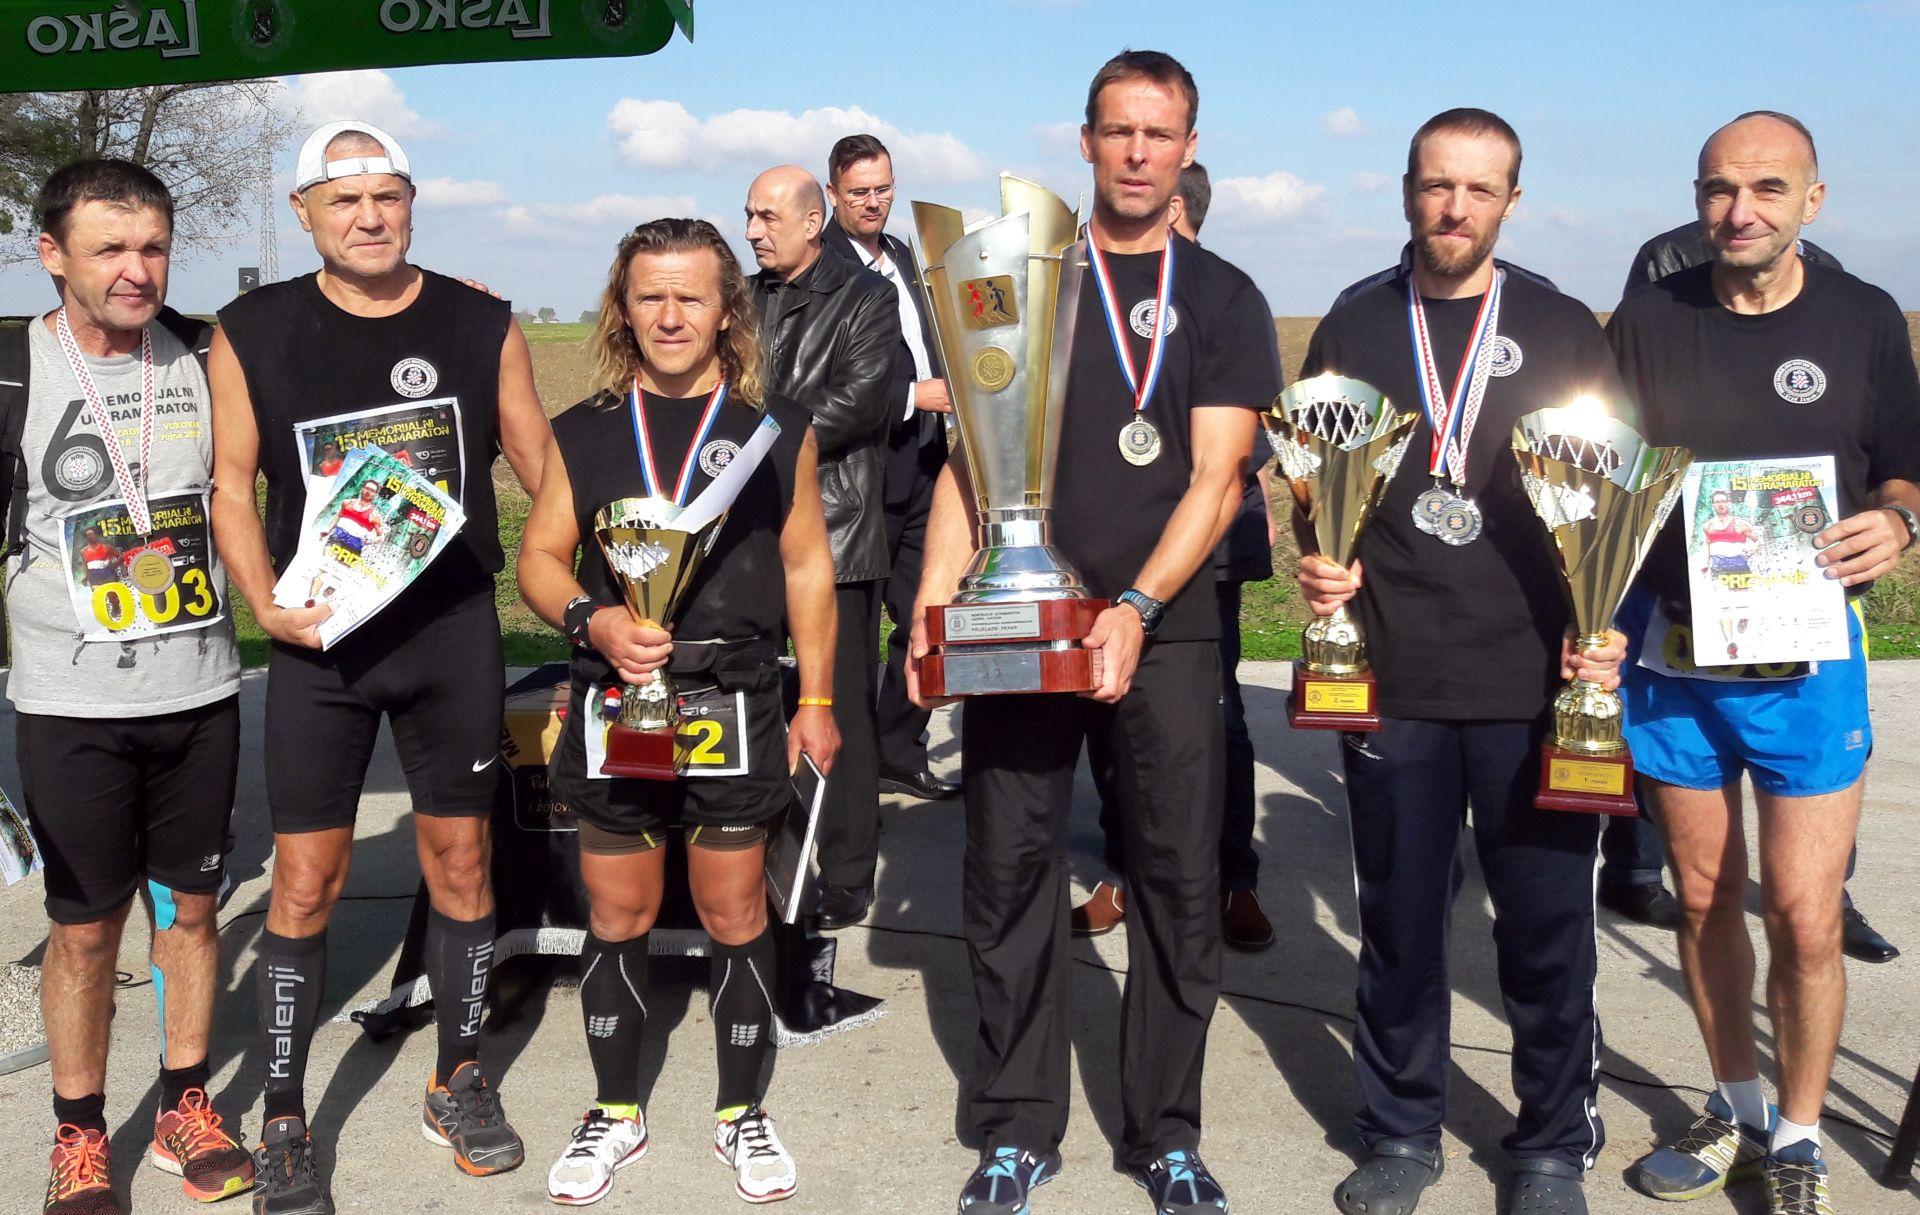 POBJEDNIK SLOVENAC: 15. Međunarodni memorijalni ultramaraton Zagreb – Vukovar